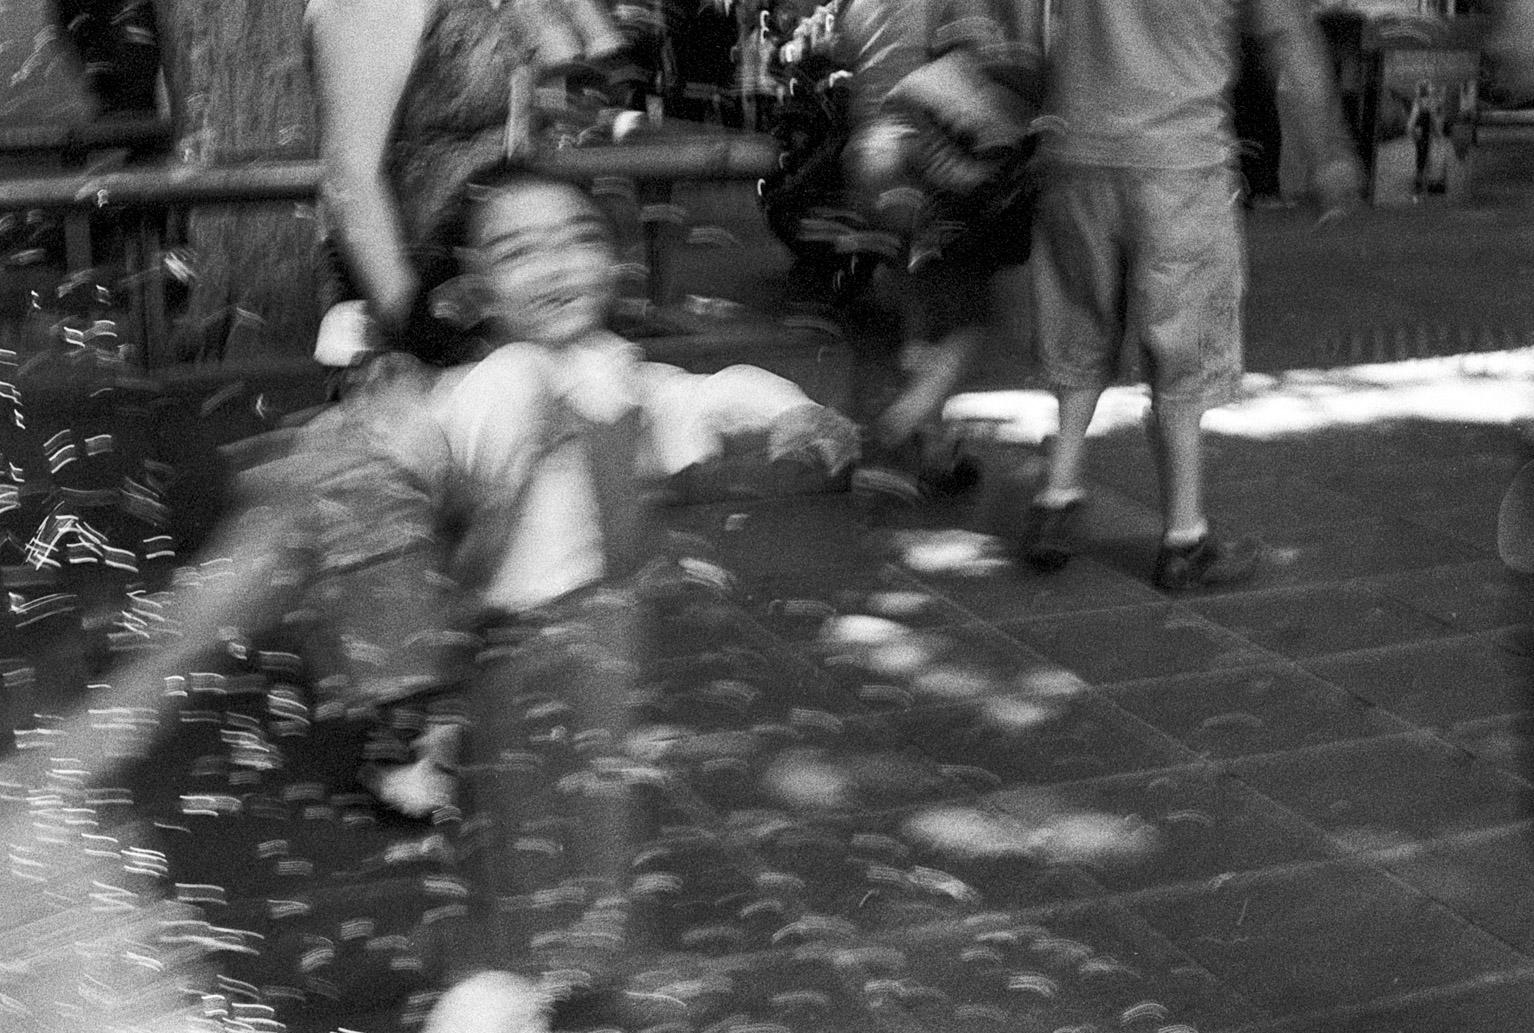 20190523_MexicoCIty_M5-KodakTrix400_023.jpg